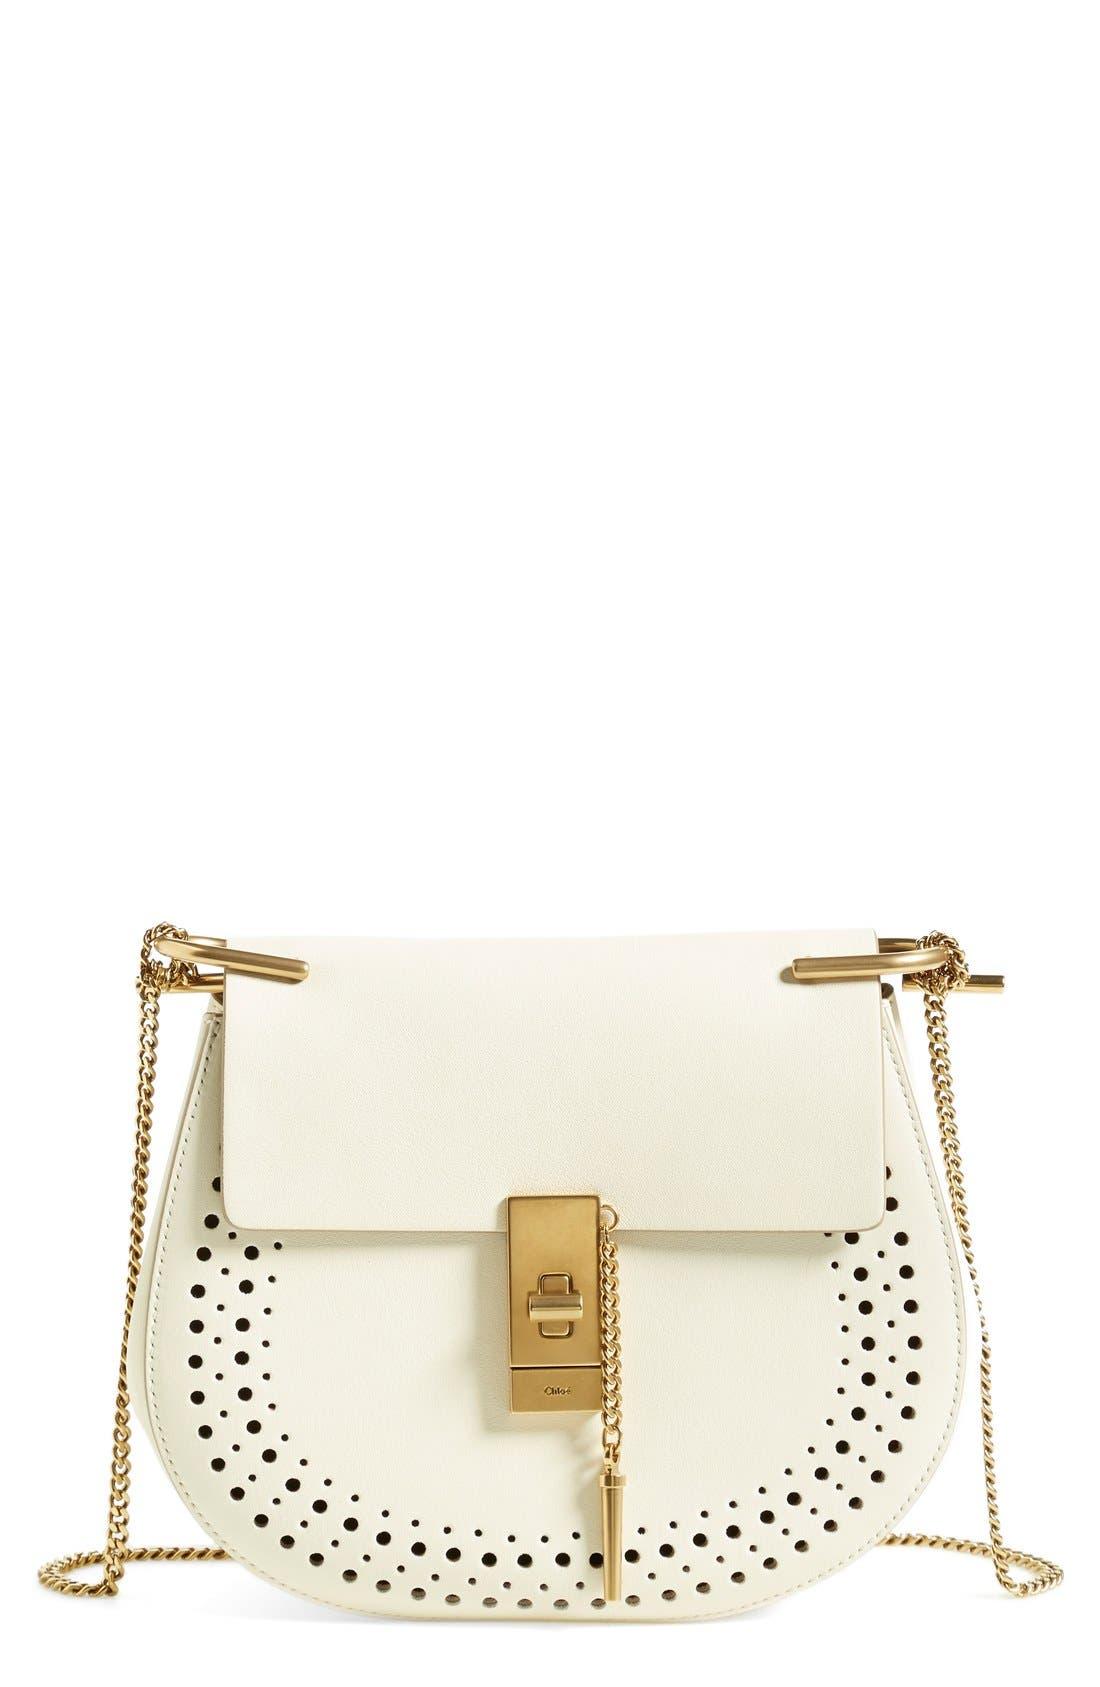 'Mini Drew' Calfskin Leather Shoulder Bag,                             Main thumbnail 1, color,                             100